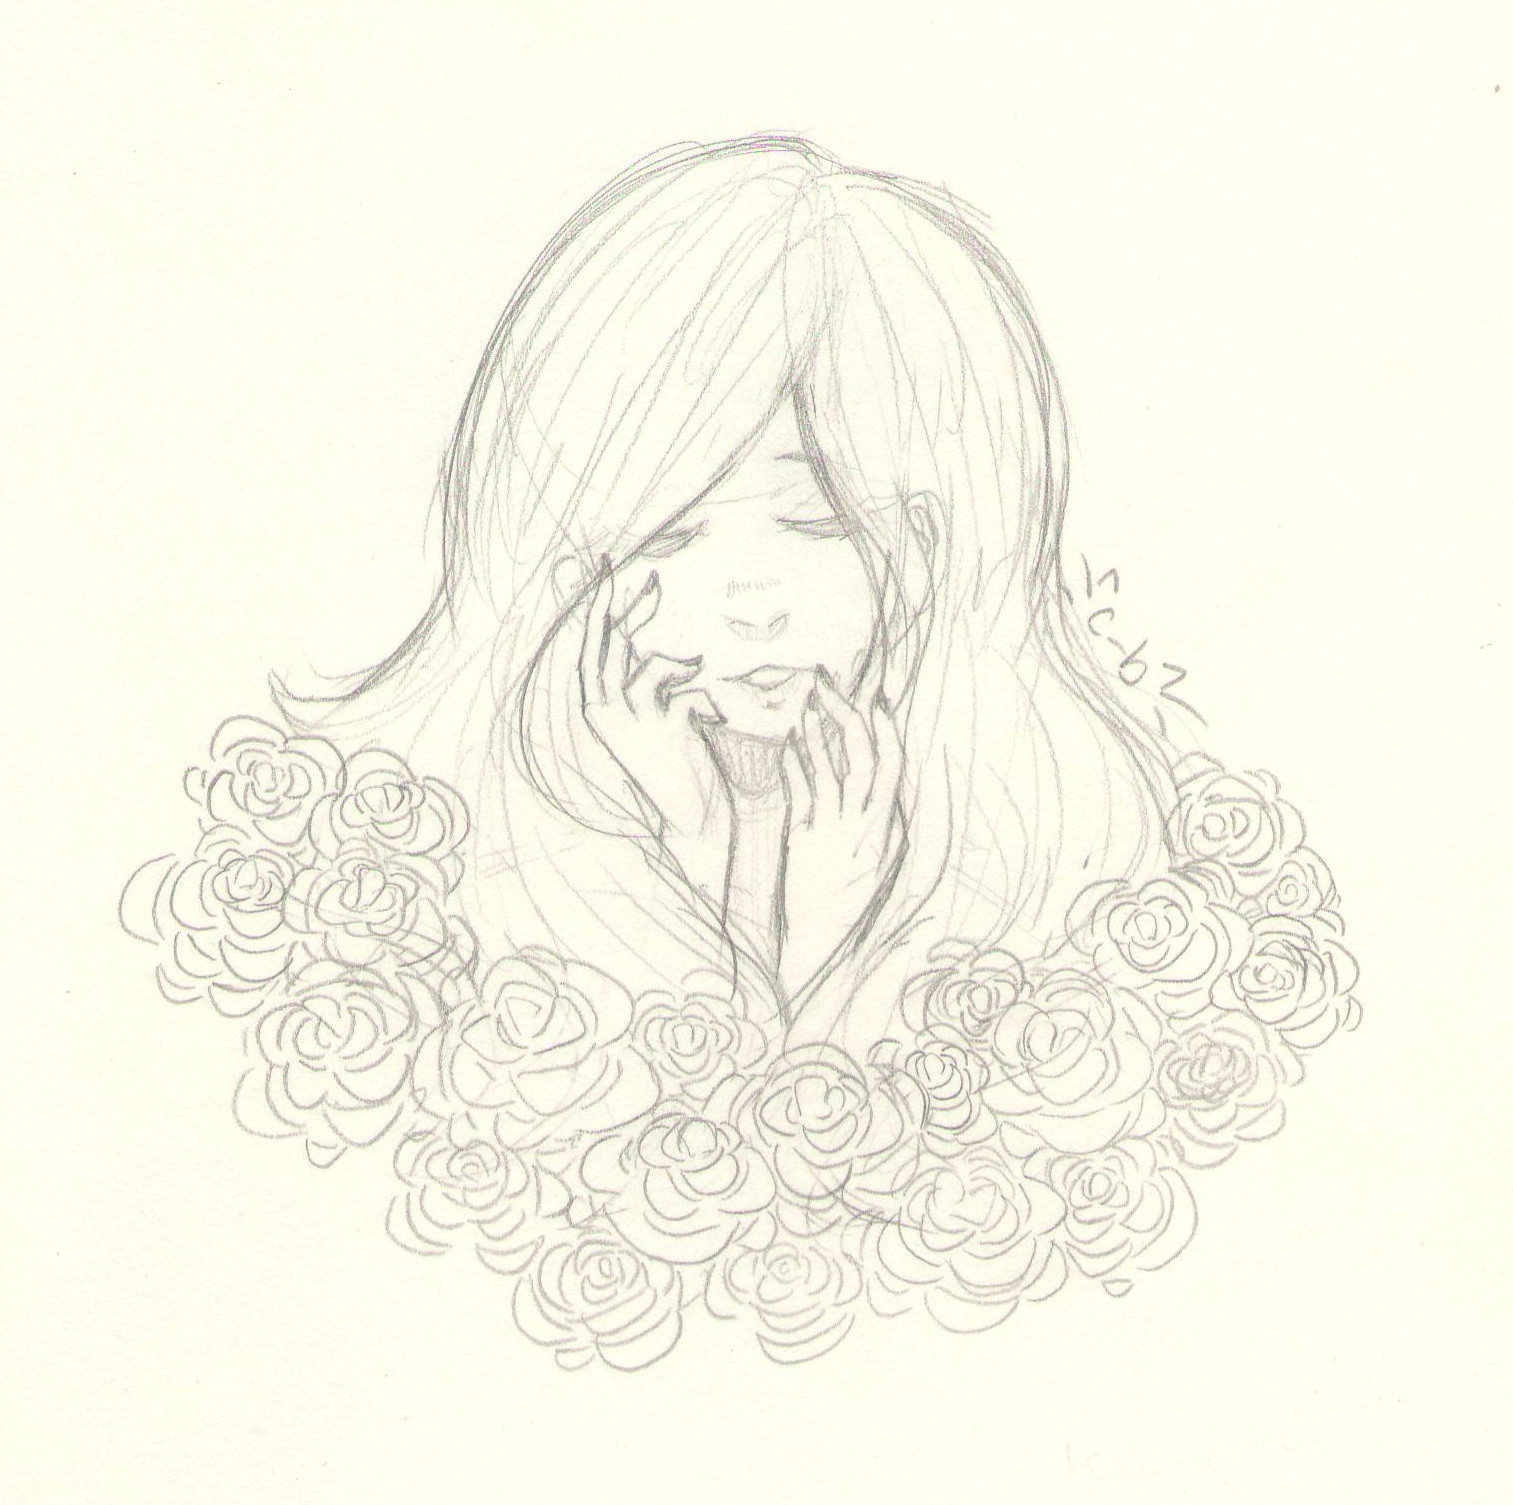 i found a nice way to draw roses roses flowers animegirls anime traditional art pencildrawing myart